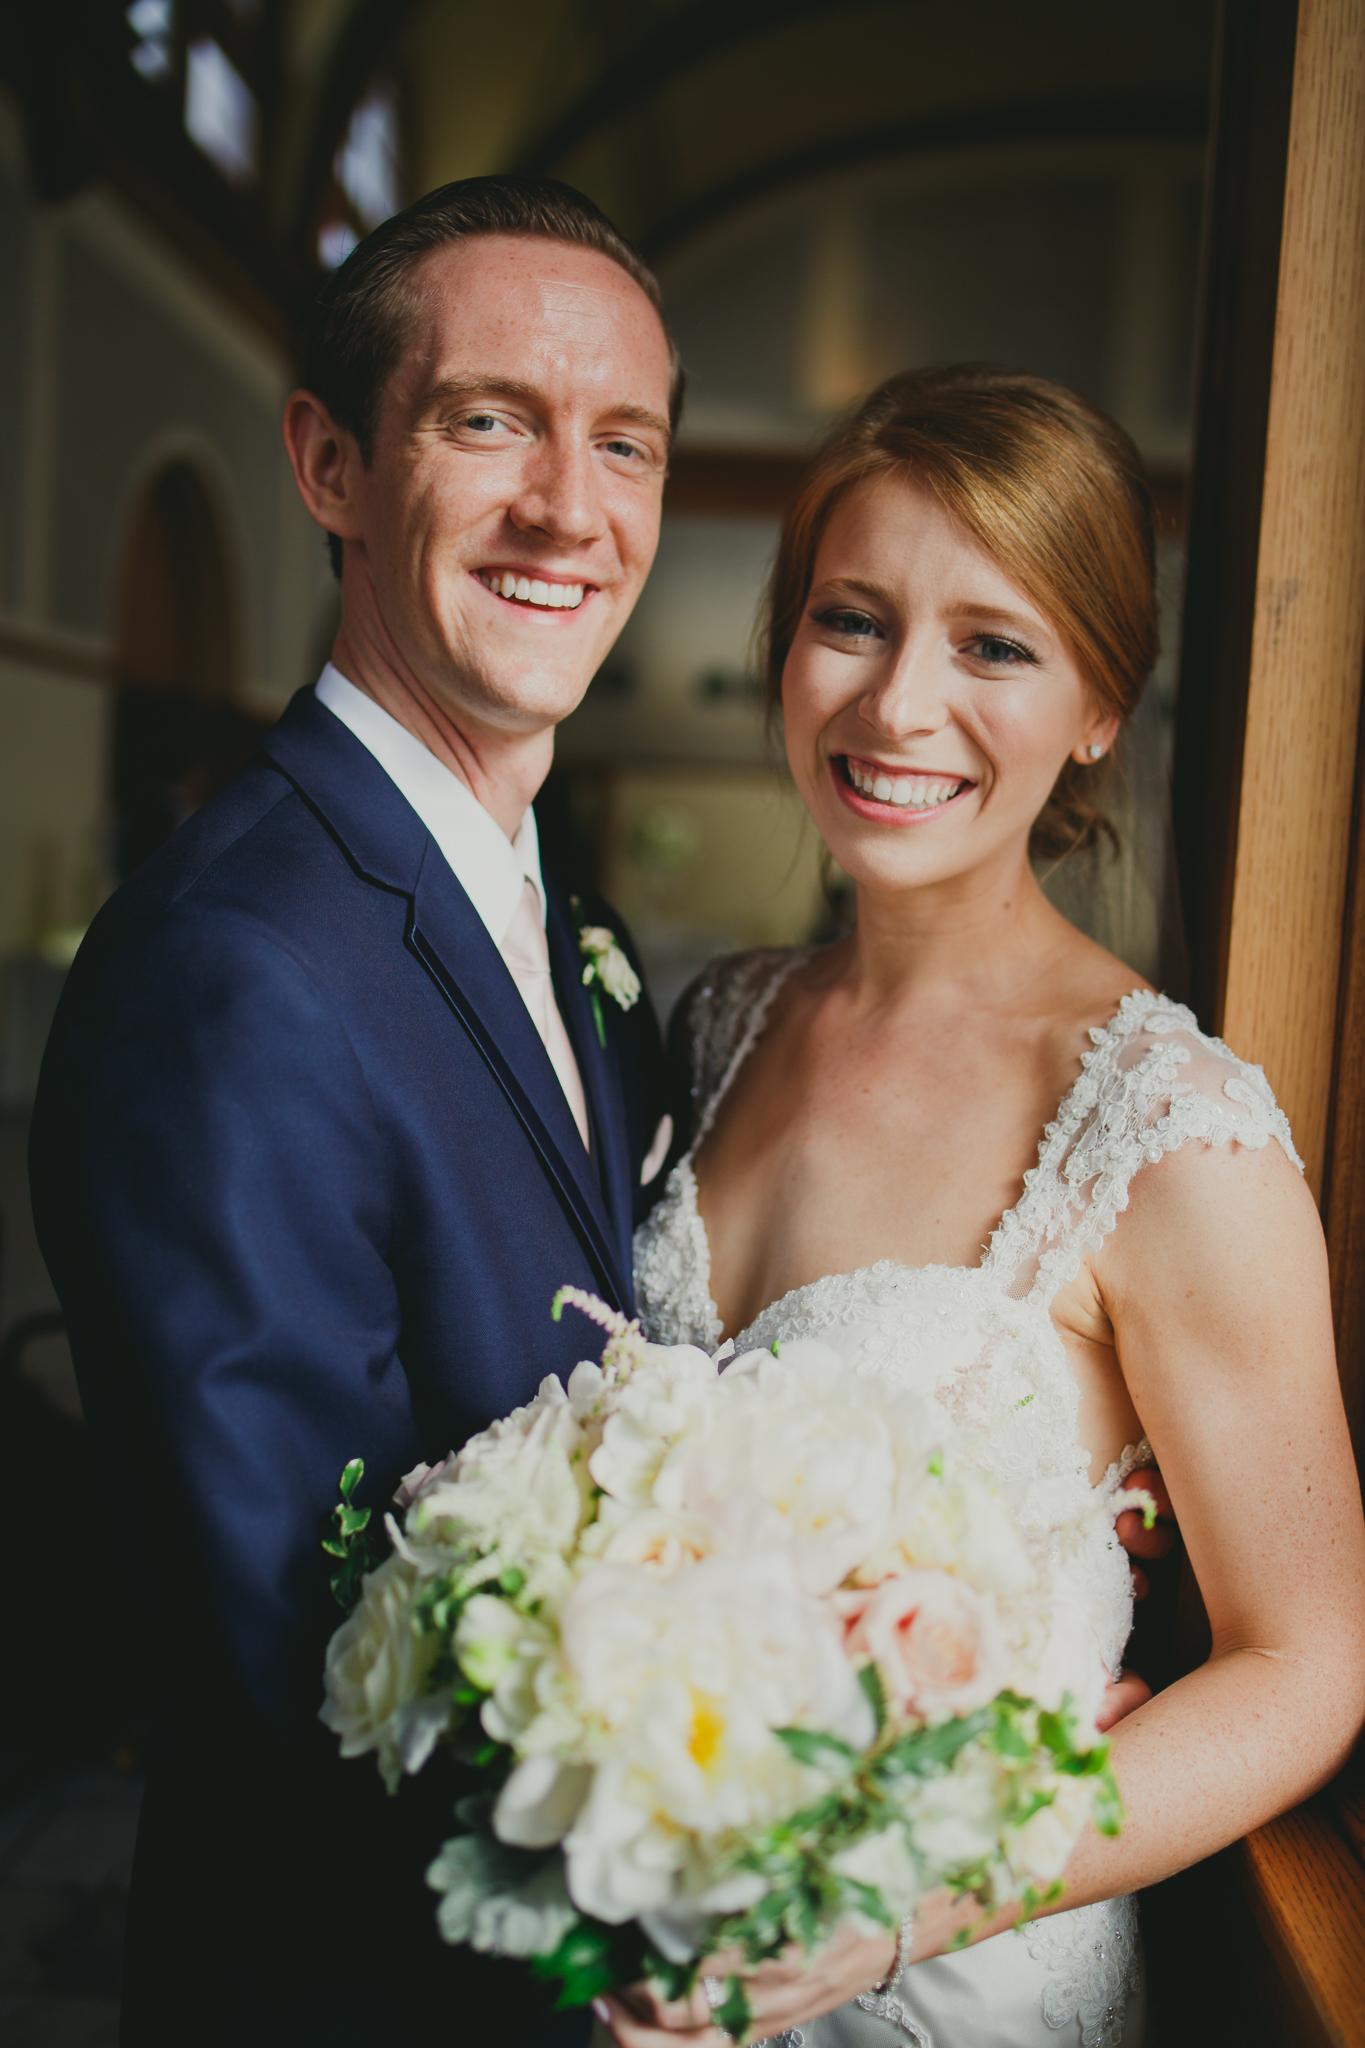 Michael and Kelly - the ashton depot - wedding DFW - wedding photographer- elizalde photography (65 of 150).jpg